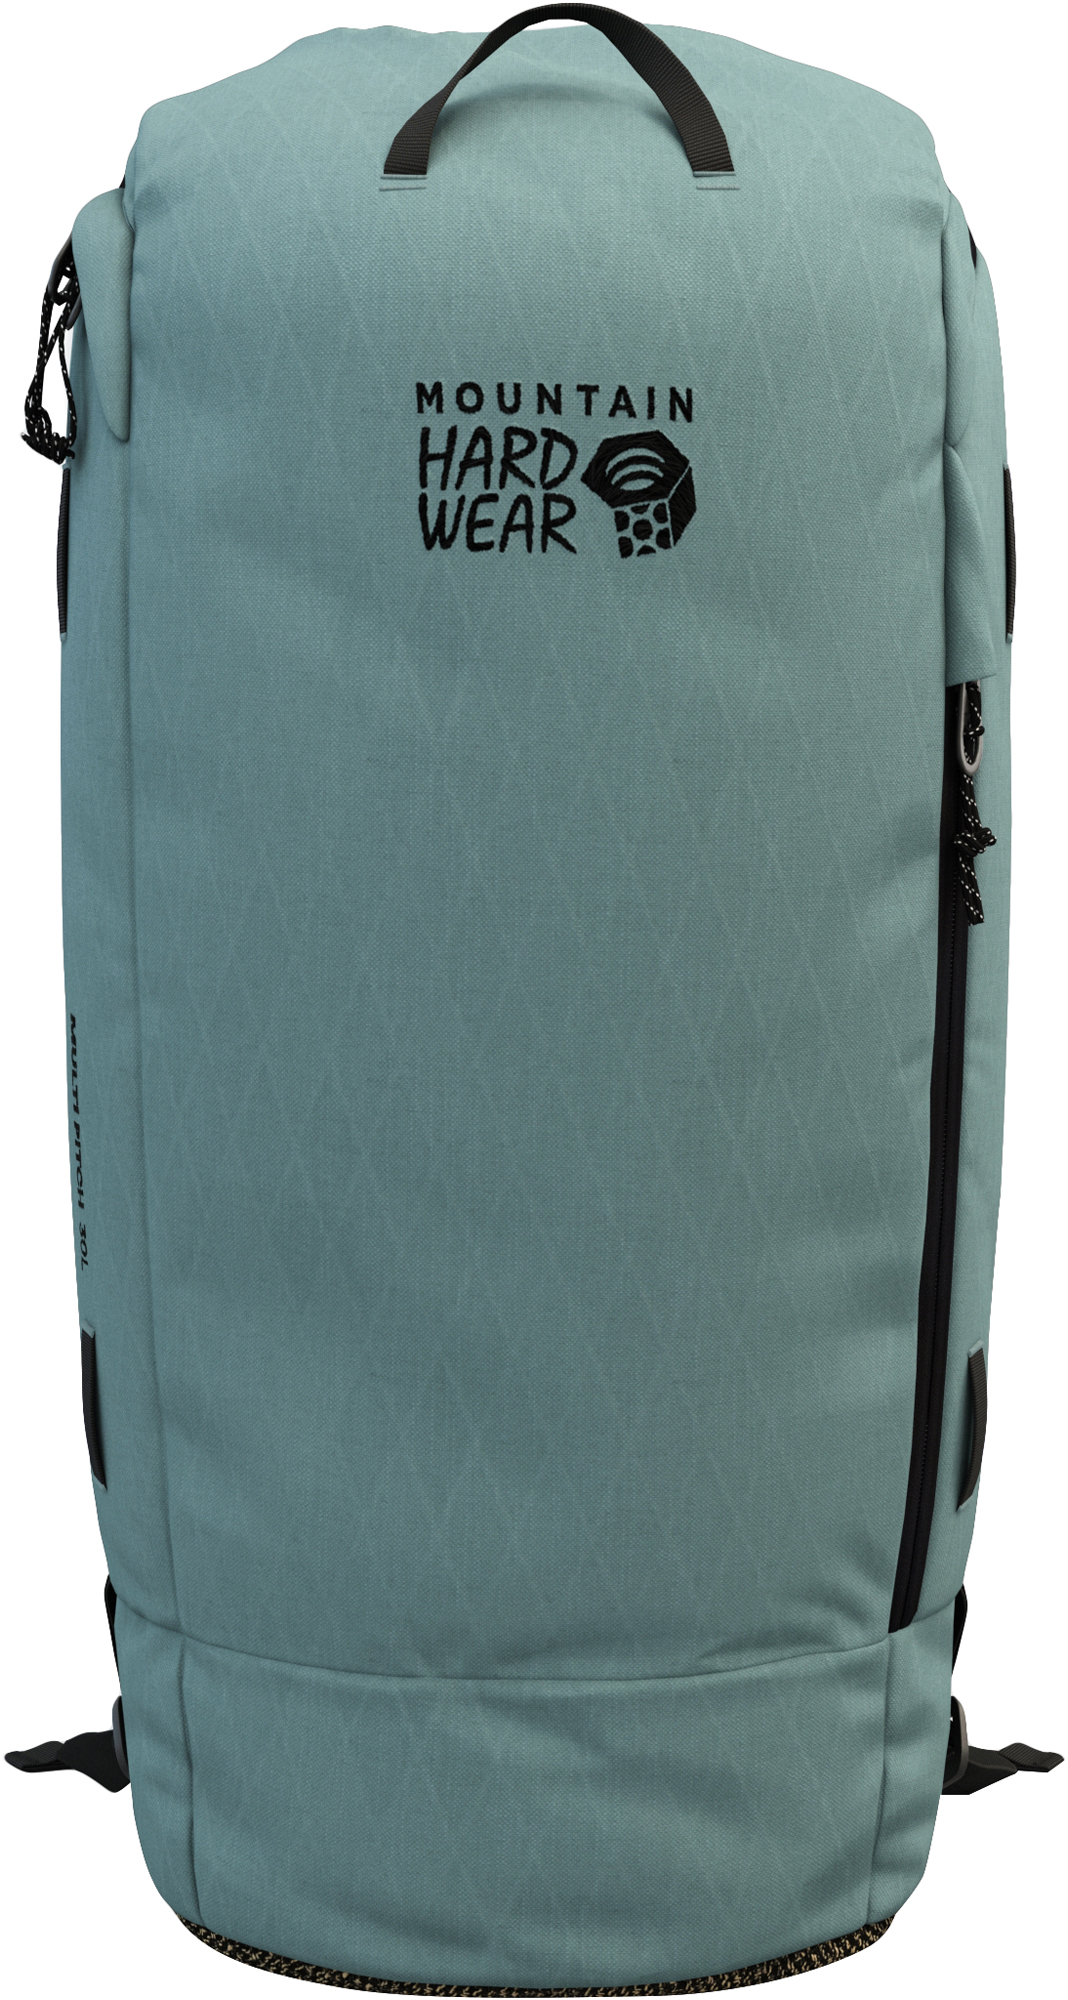 Mountain Hardwear Рюкзак Mountain Hardwear Multi-Pitch 30 цены